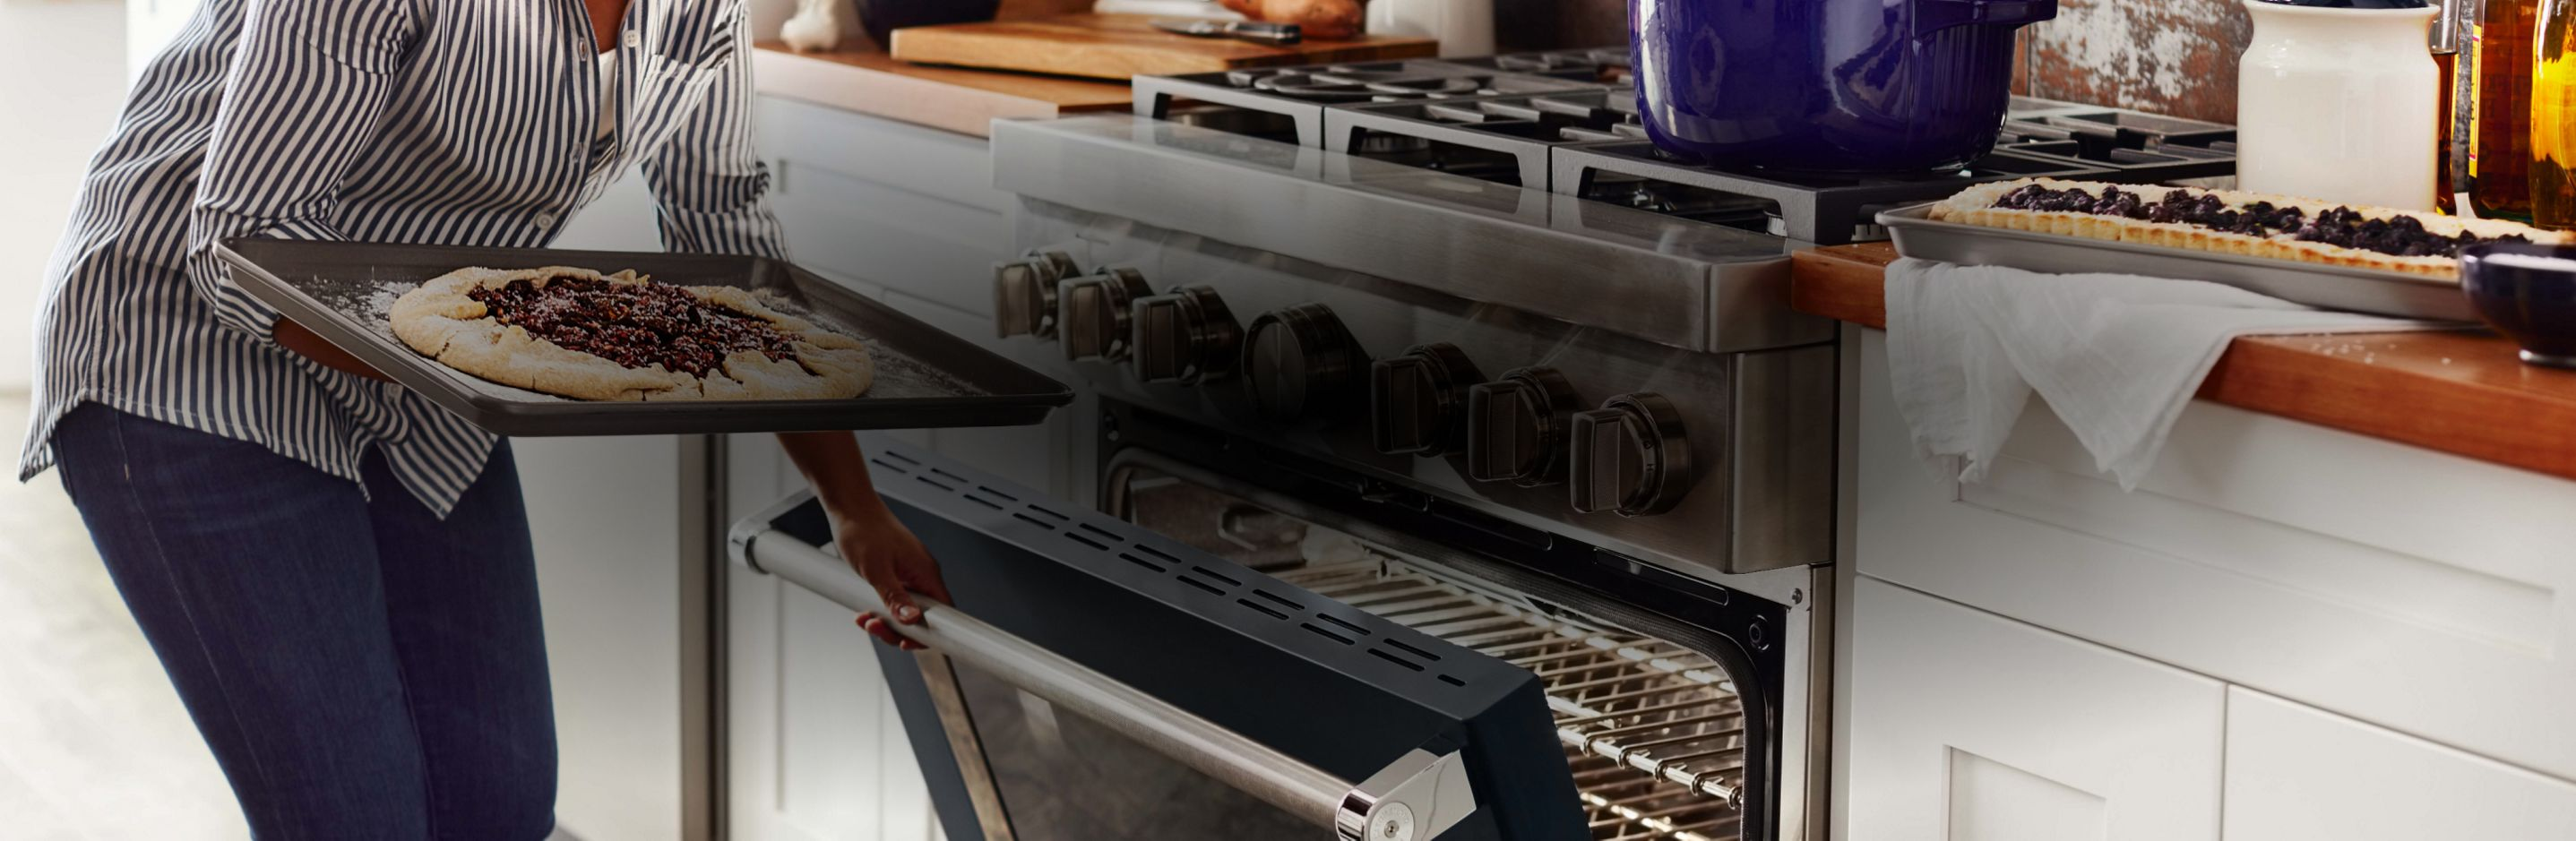 Putting pizza in a KitchenAid® range.